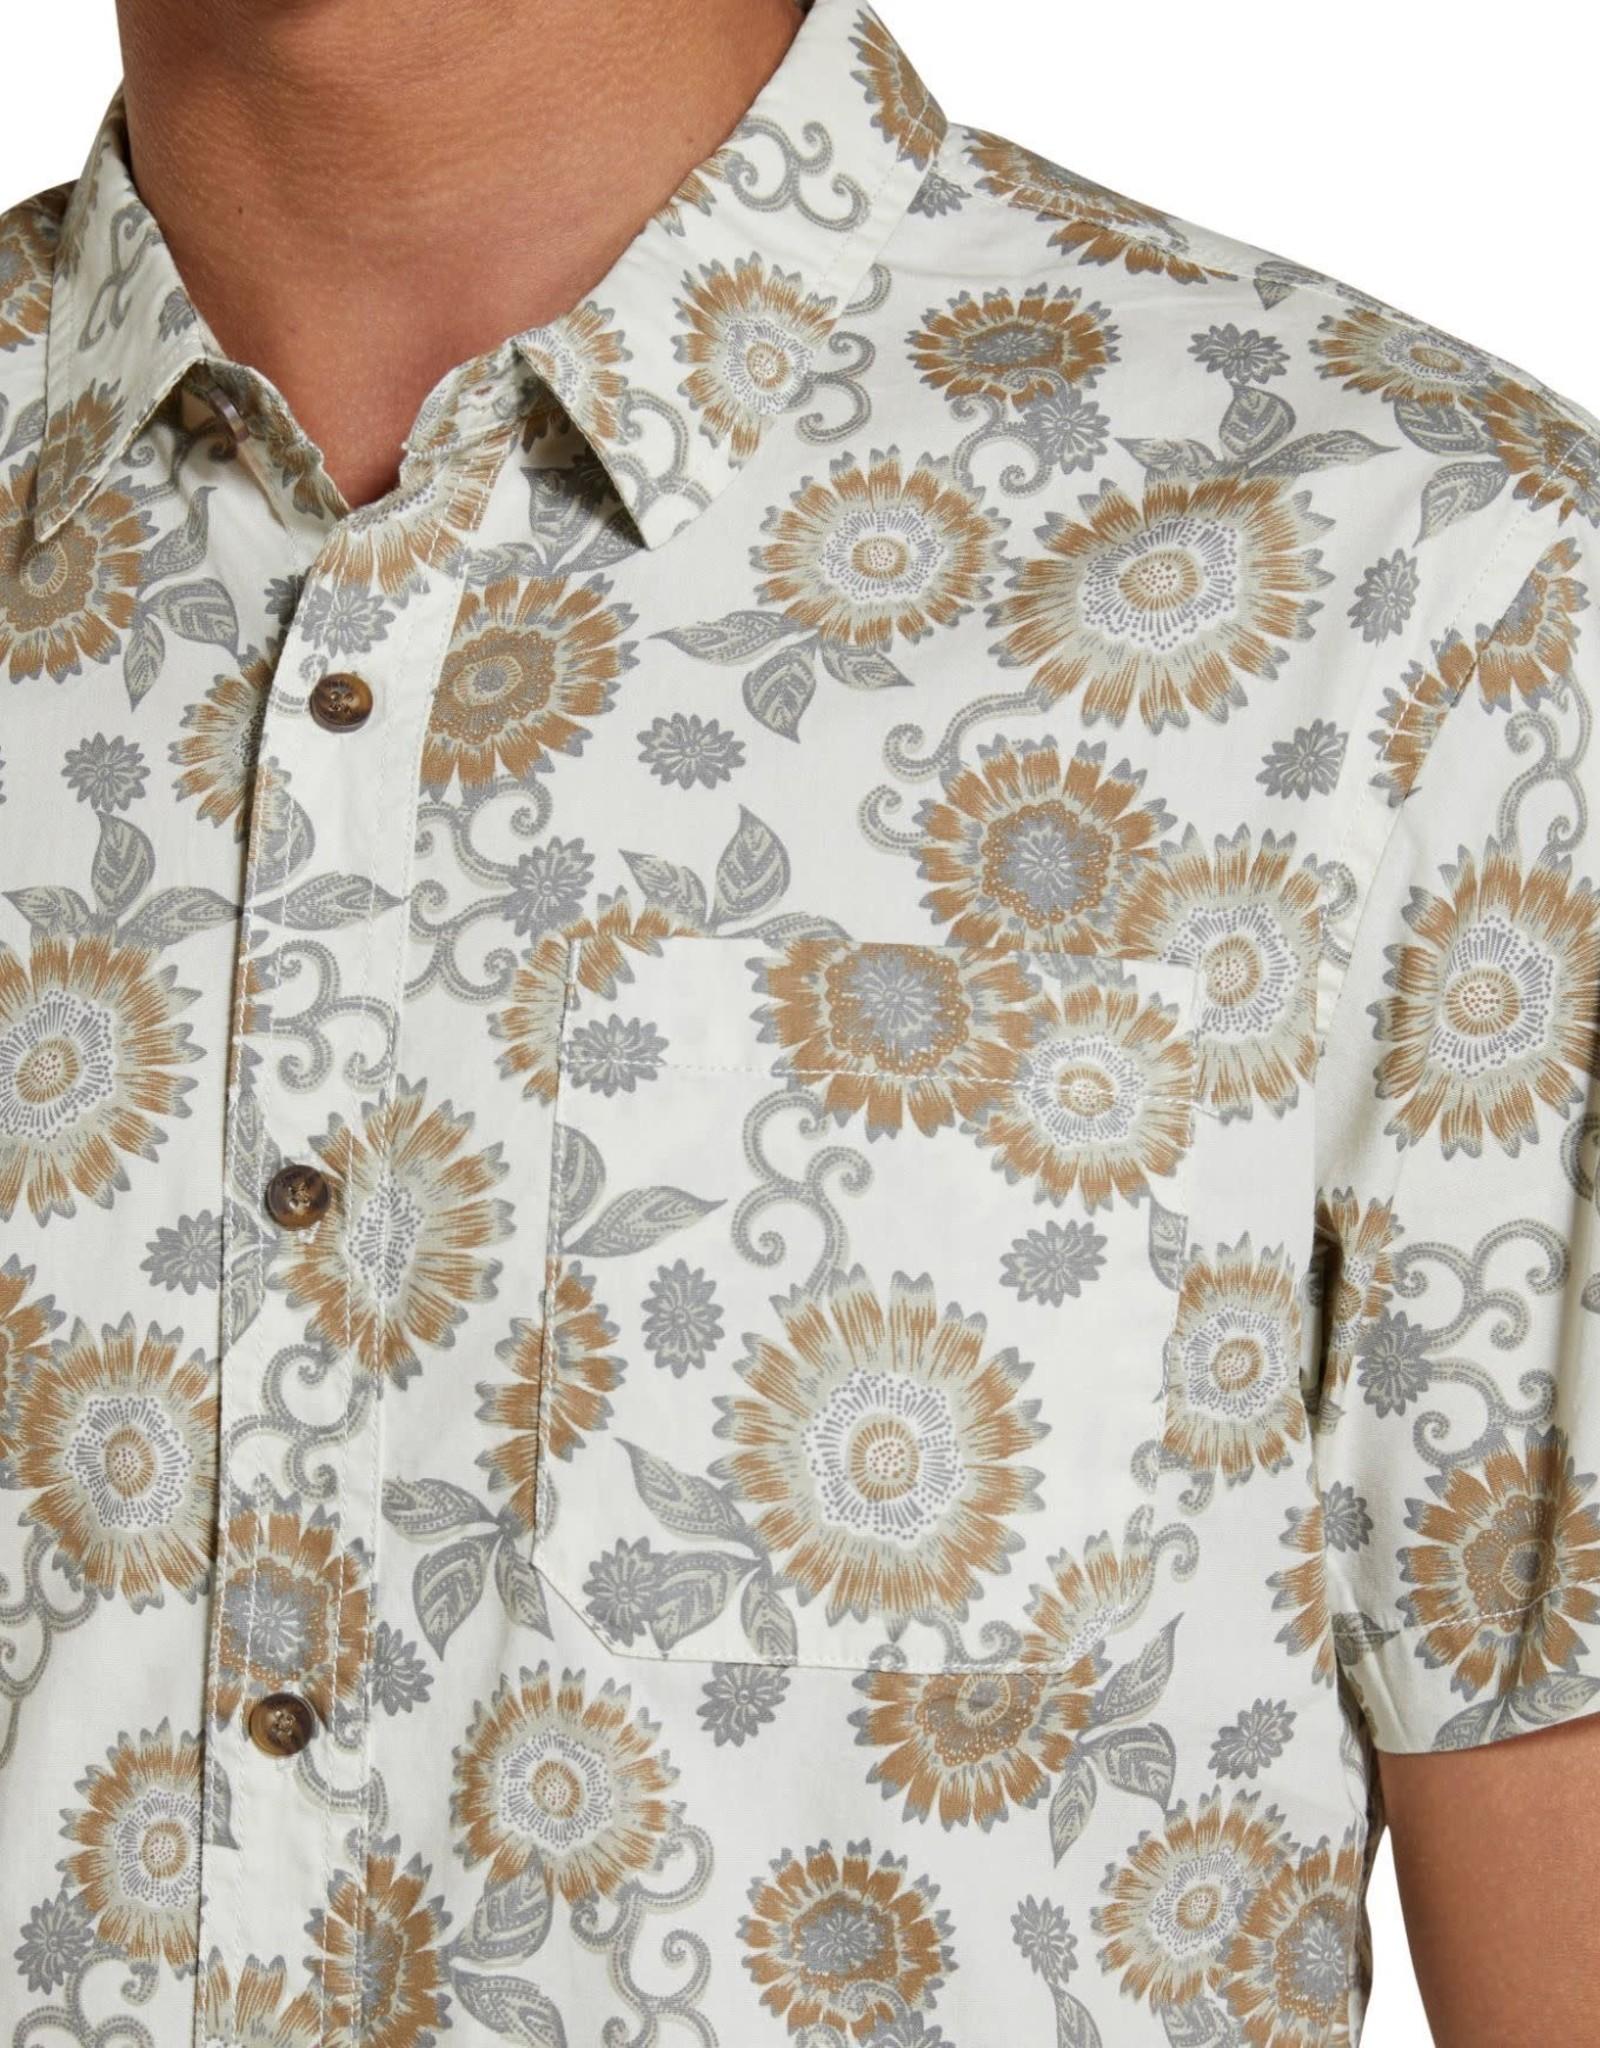 O'NEILL Sheldon Short Sleeve Woven Shirt